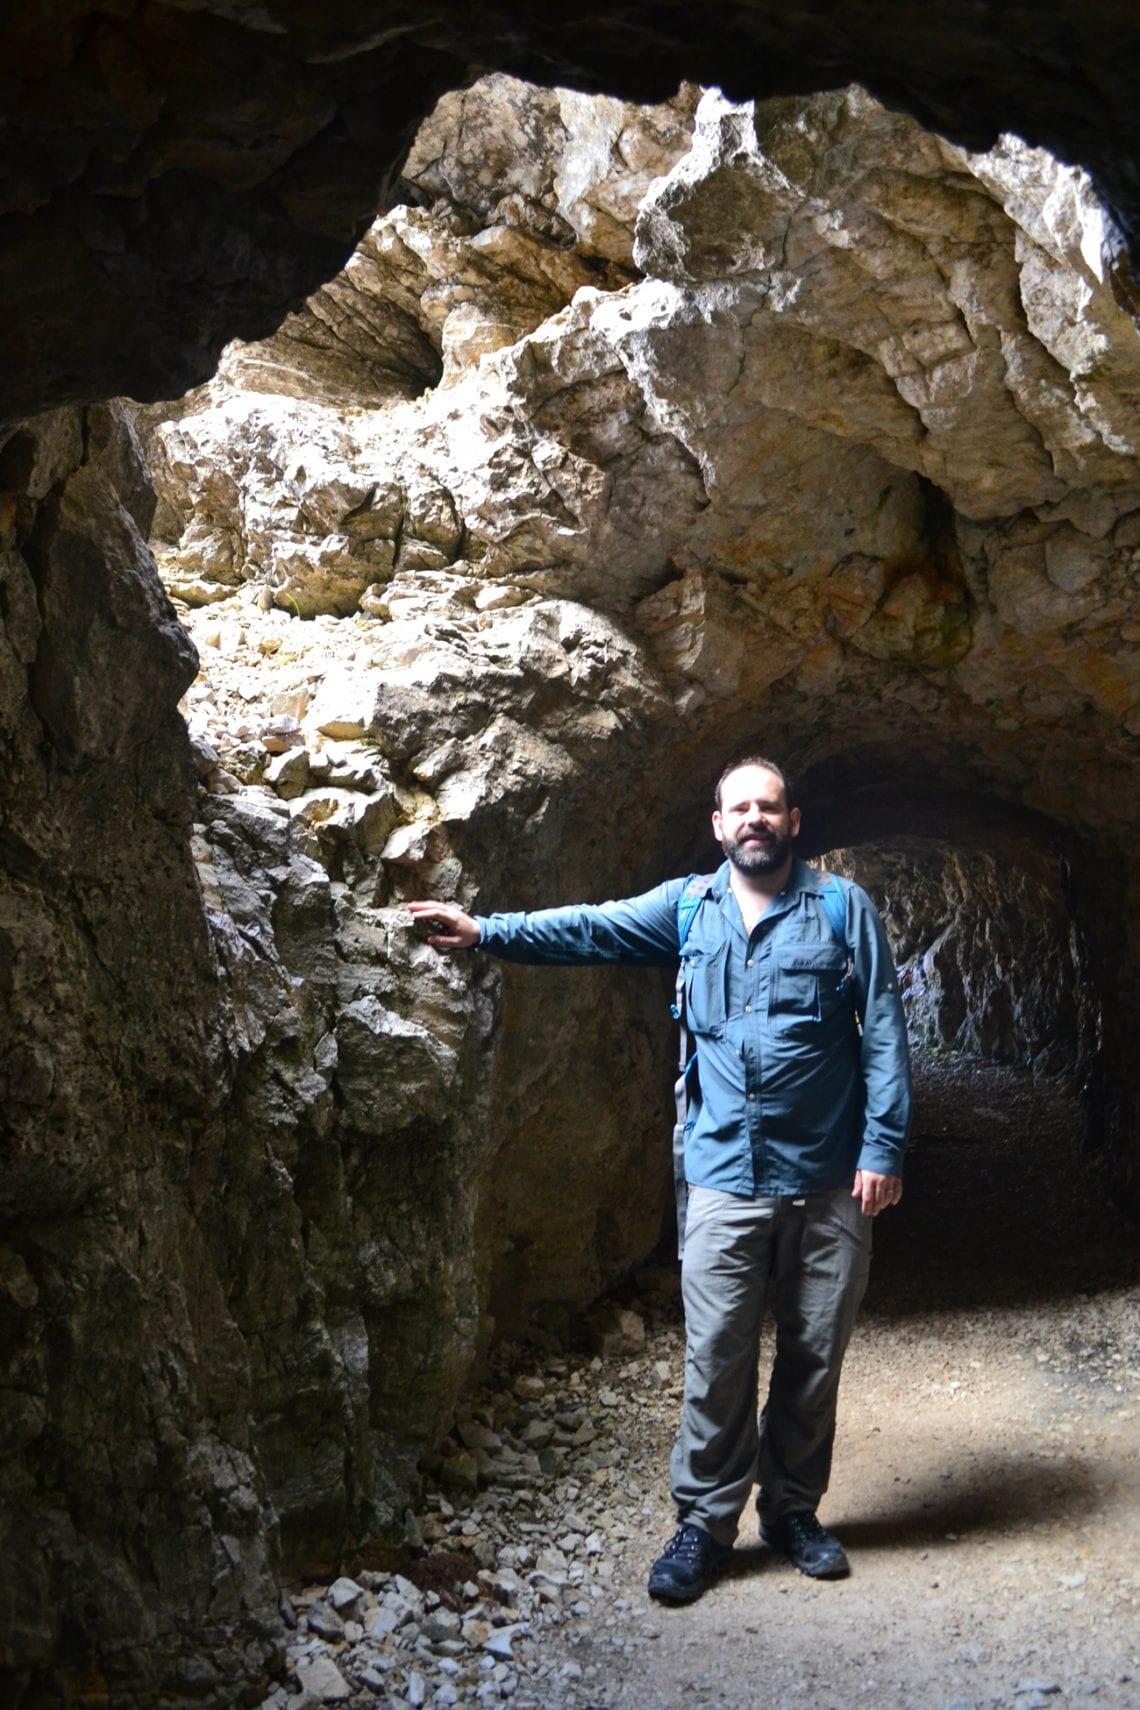 strada 52 maz posing in the tunnel